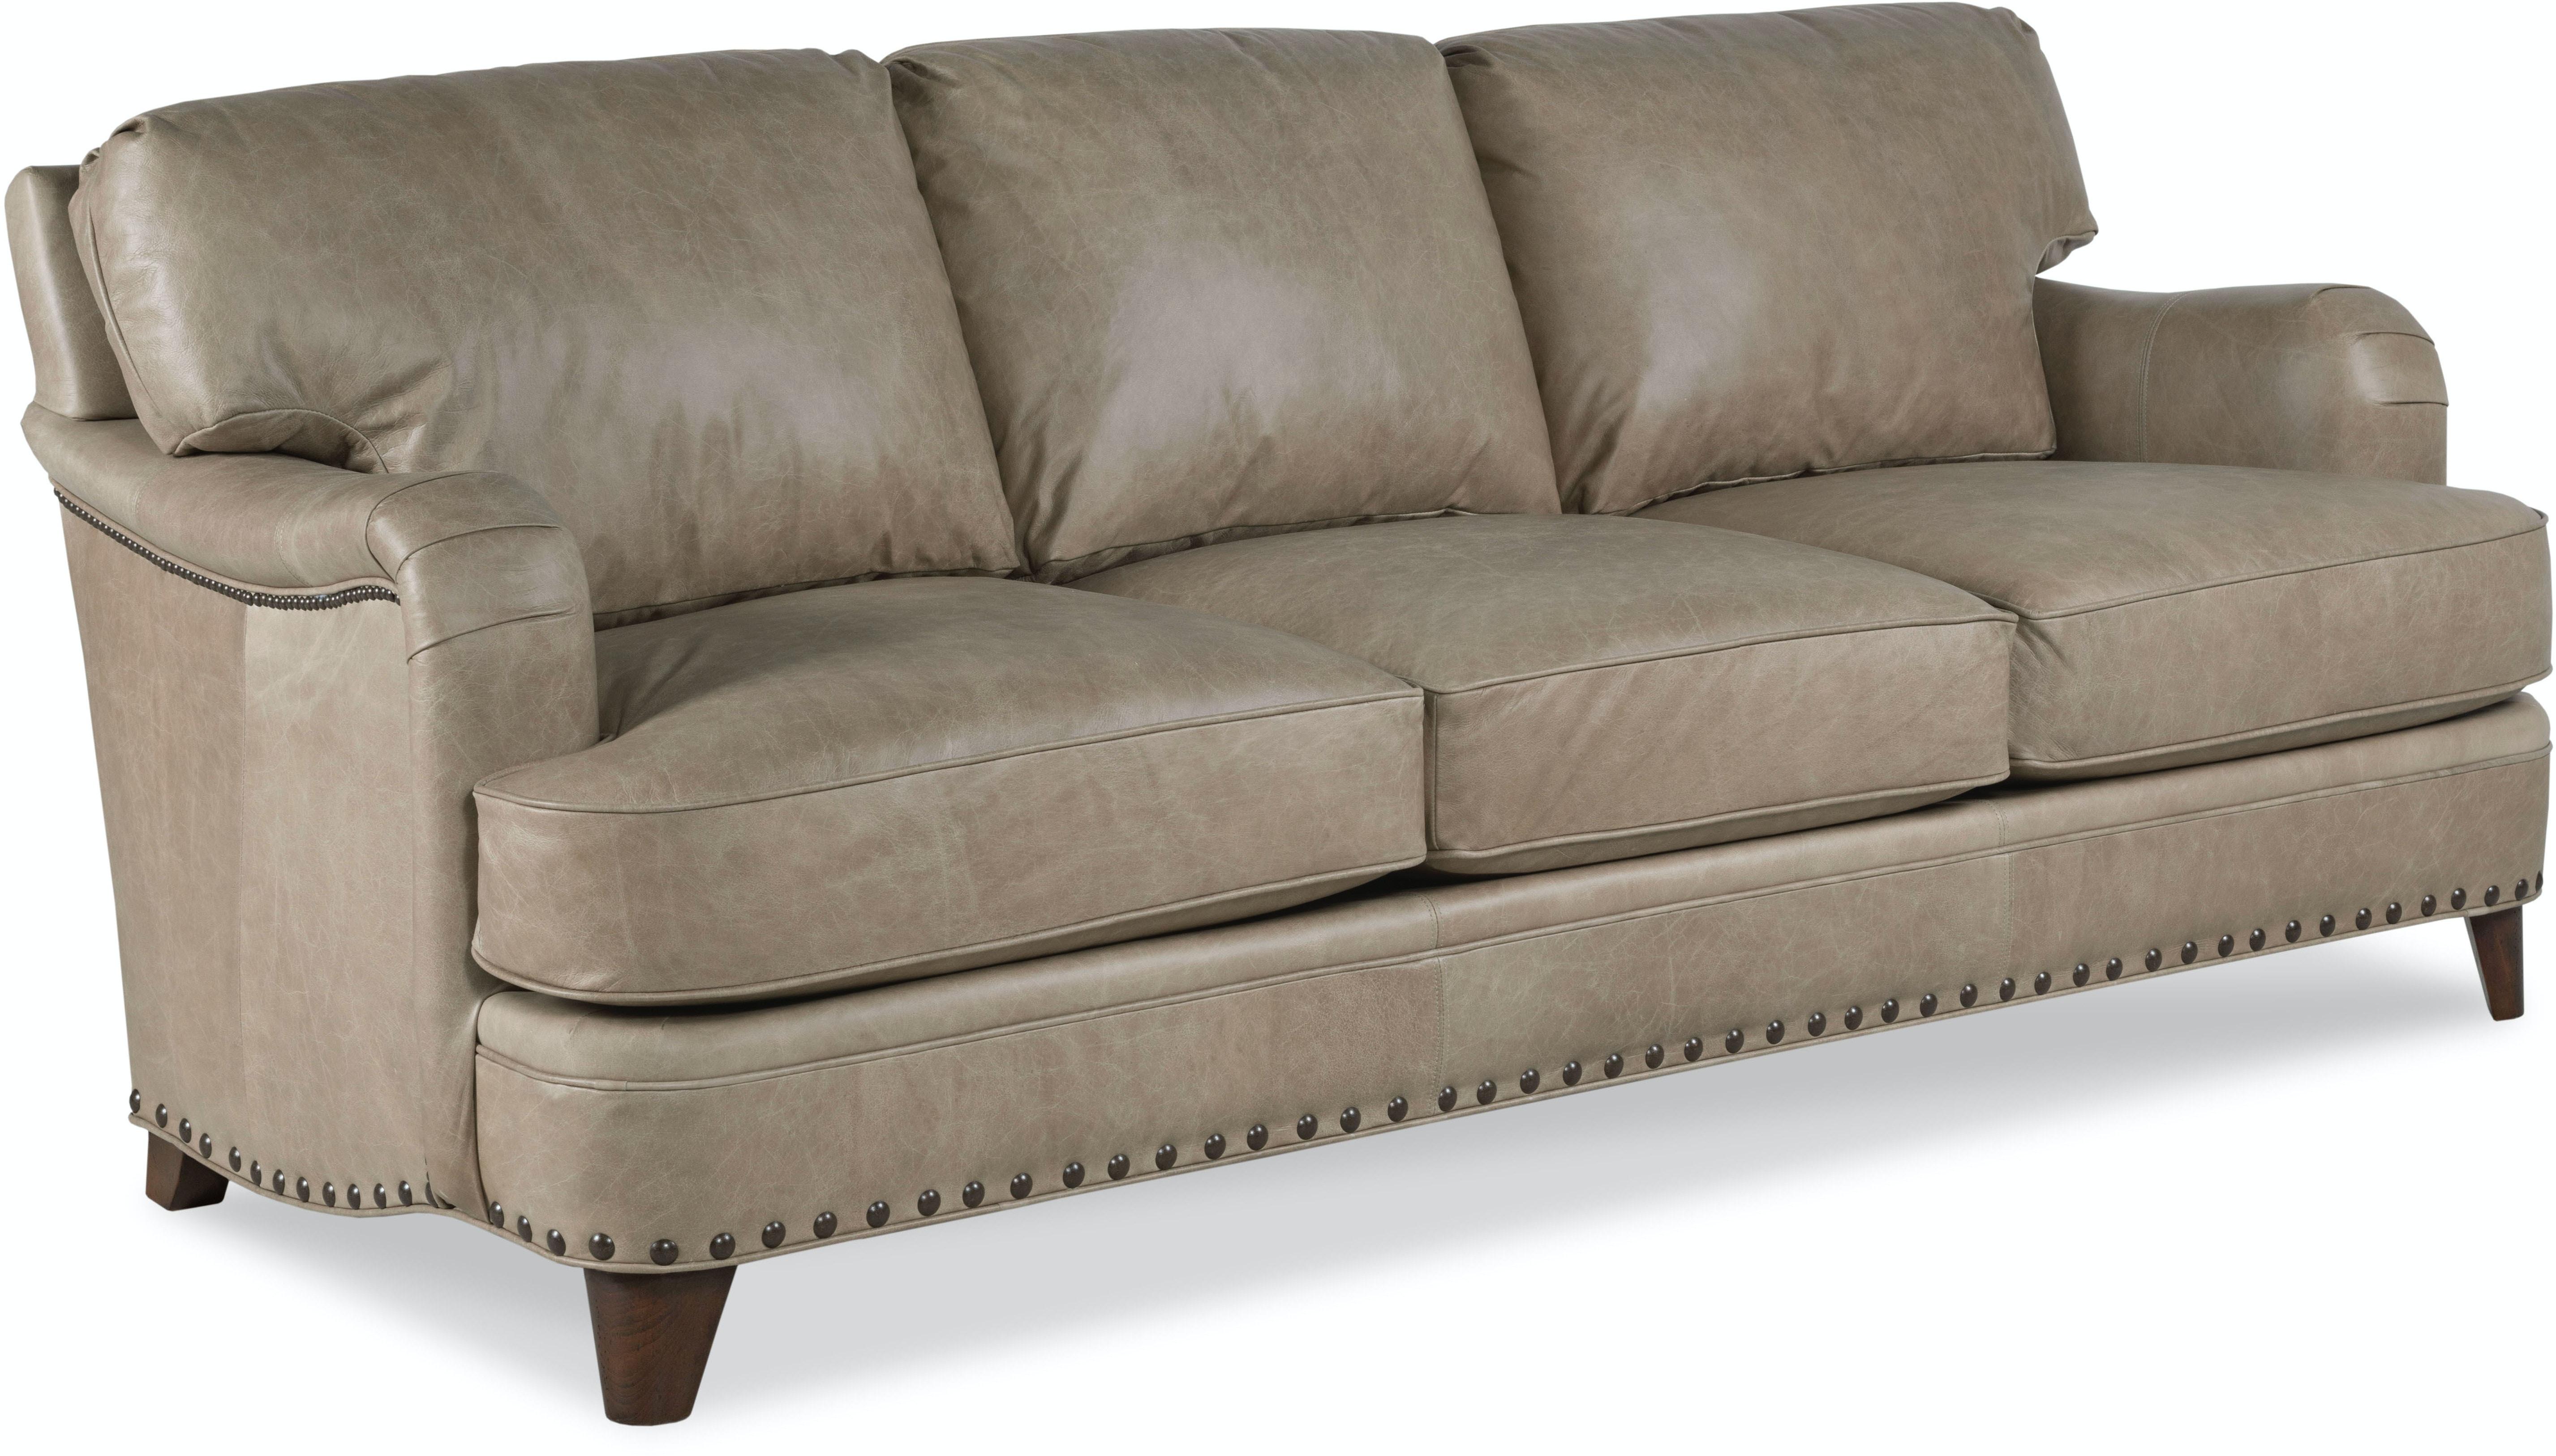 Fairfield Chair pany Living Room Sofa 2709 50 Cherry